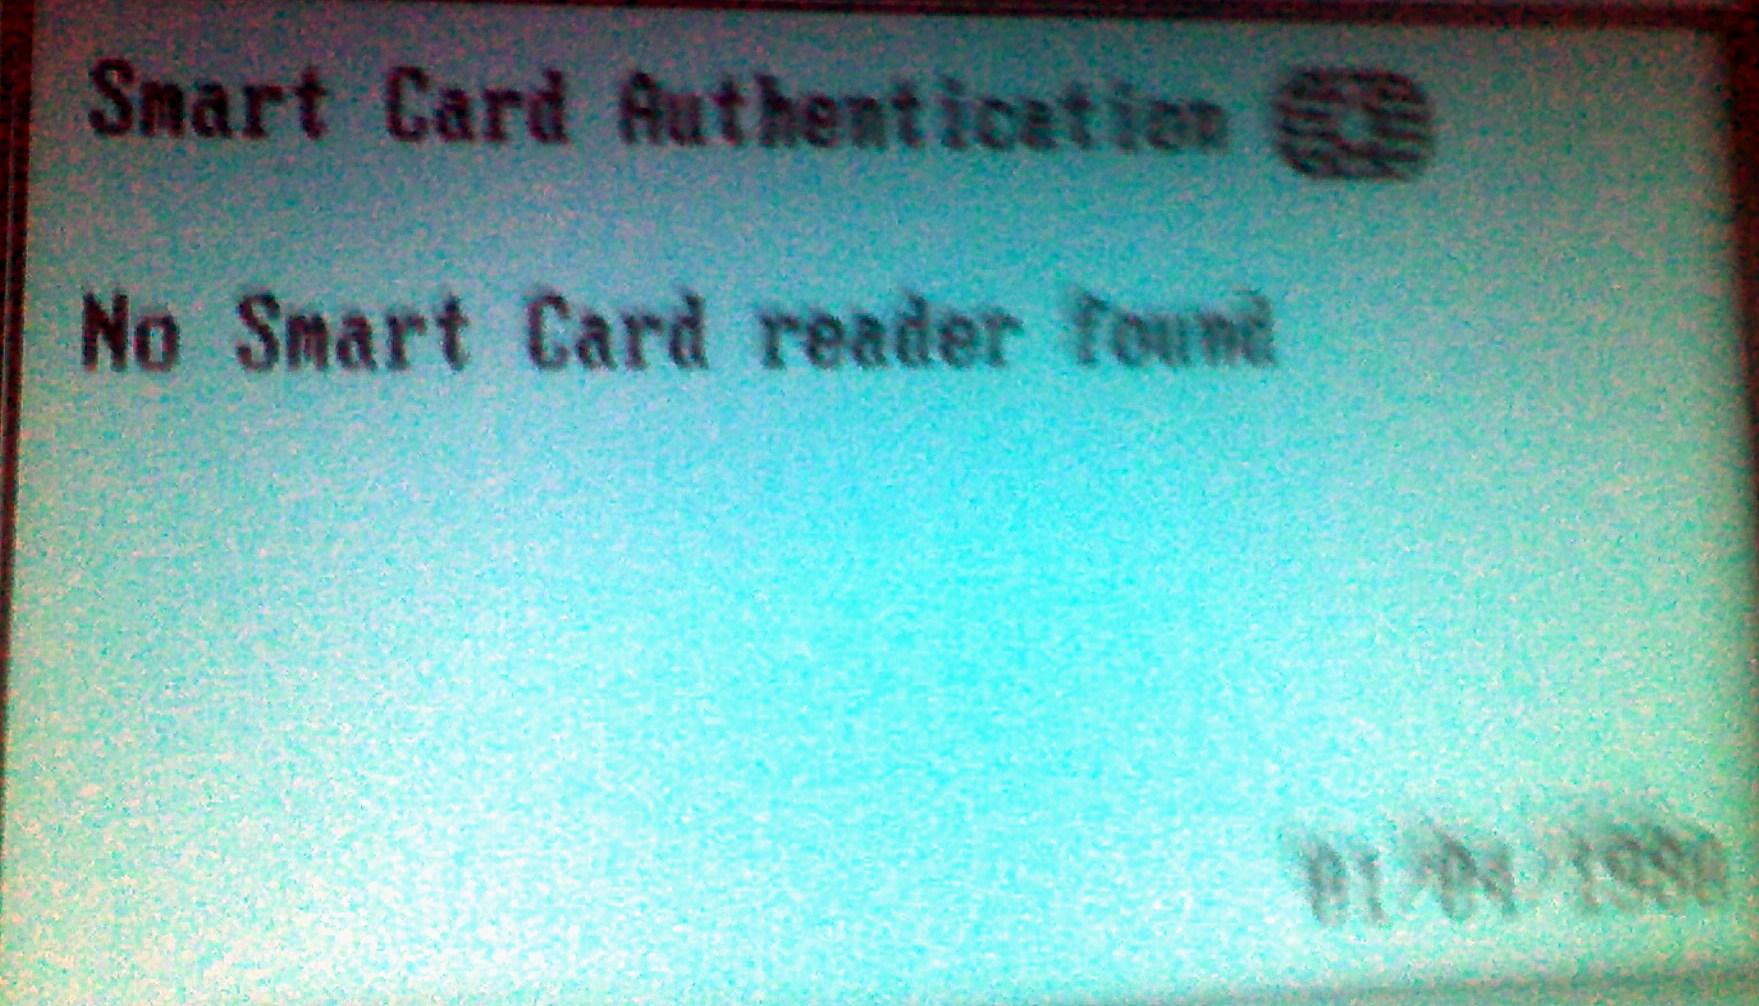 HP Compaq dc7600 Bios Error 162 and invalid serial No